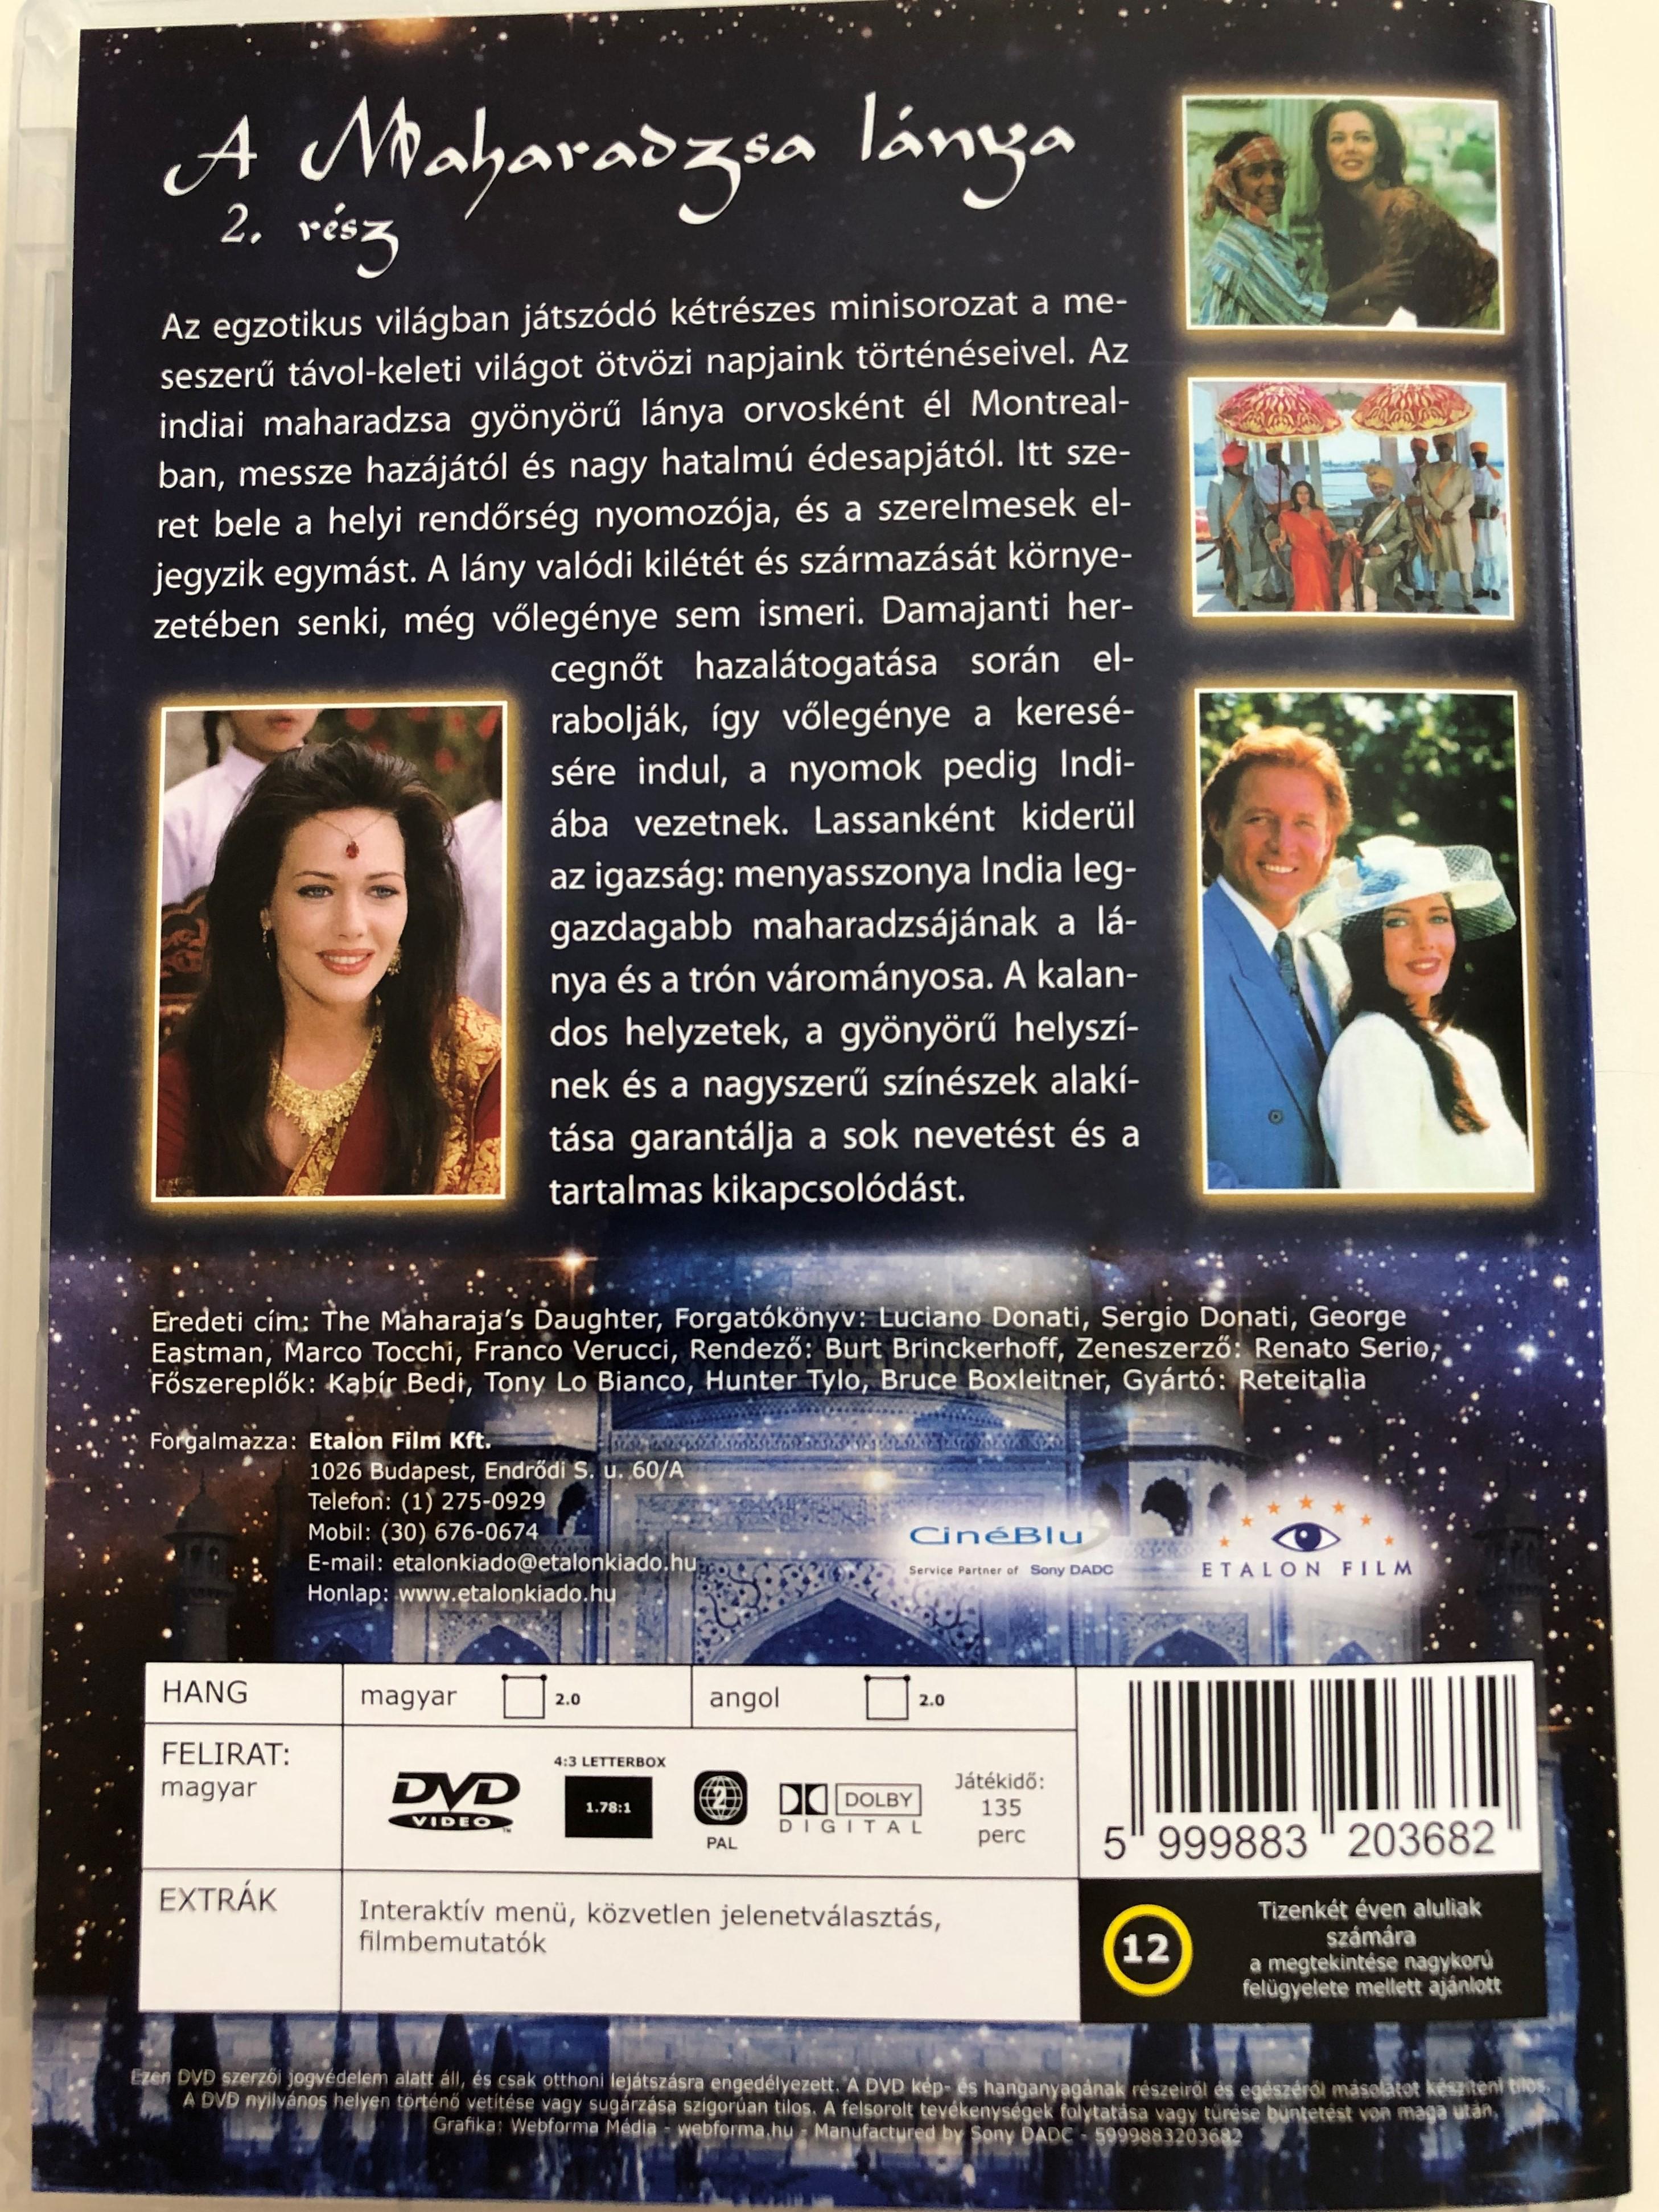 the-maharaja-s-daughter-2.-dvd-1994-a-maharadzsa-l-nya-2.-r-sz-directed-by-burt-brinckerhoff-starring-kabir-bedi-bruce-boxleitner-hunter-tylo-mini-series-2-.jpg